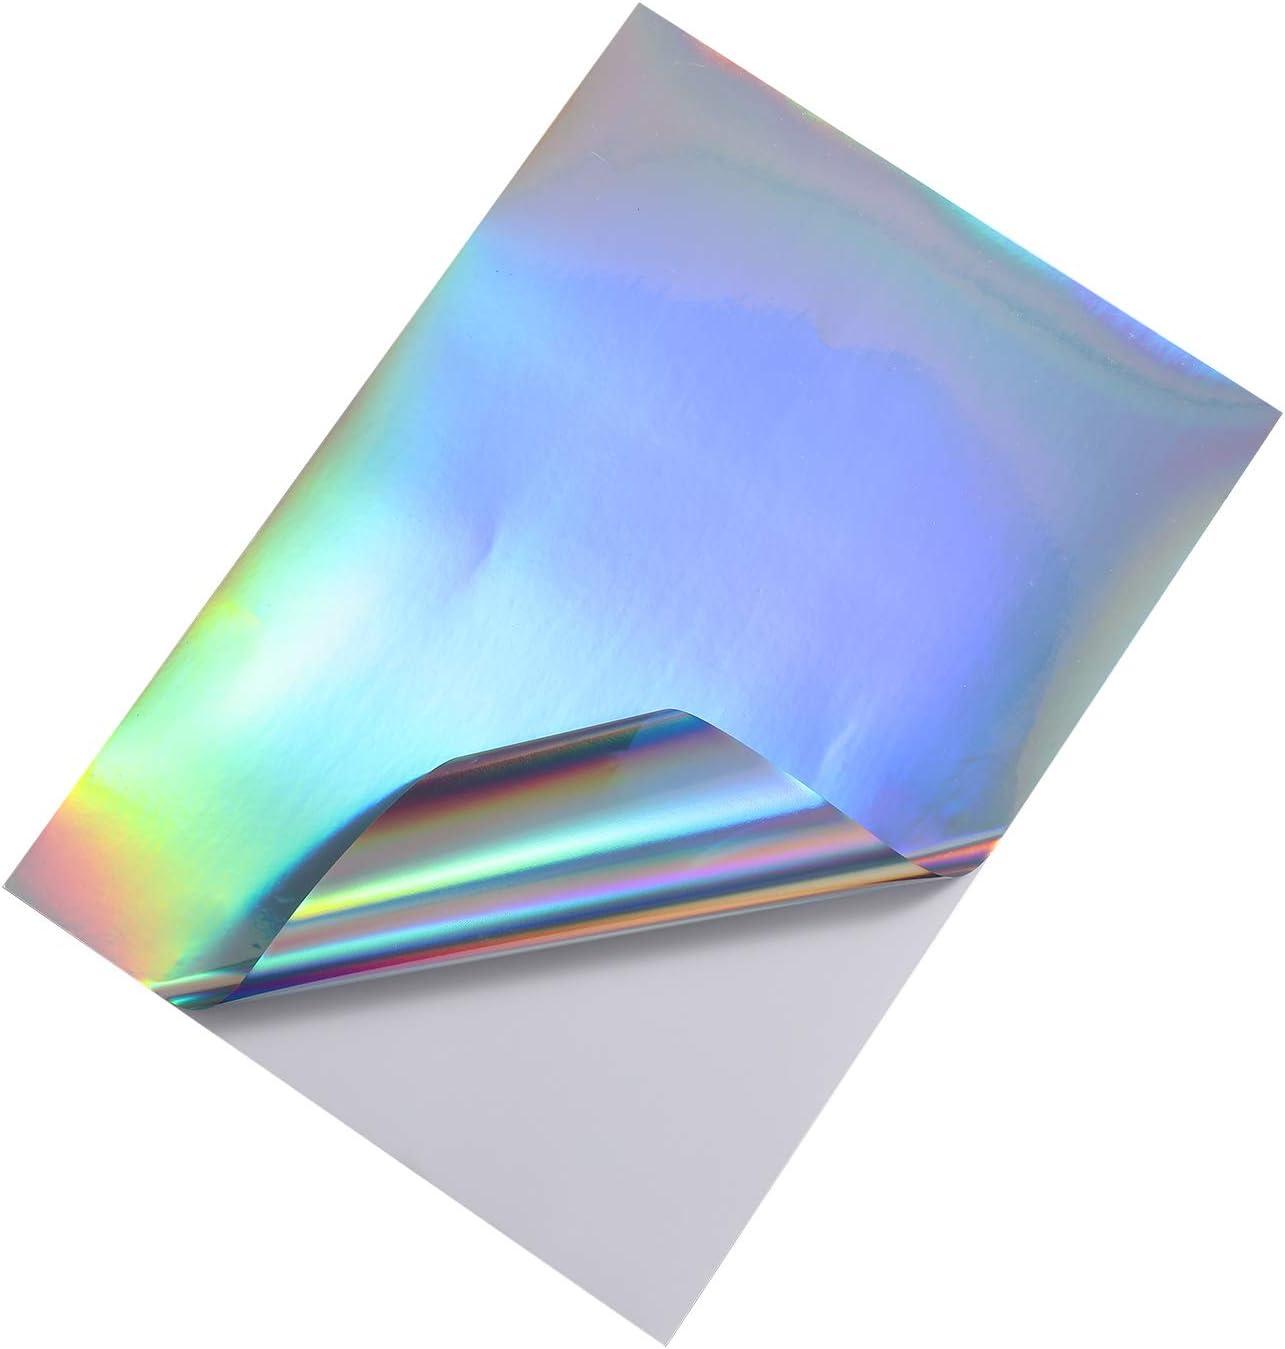 Dries Quickly Waterproof Sticker Paper Rainbow Vinyl Sticker Paper for Inkjet//Laser Printer Printable Vinyl Sticker Paper 20 sheet Holographic vinyl printing paper